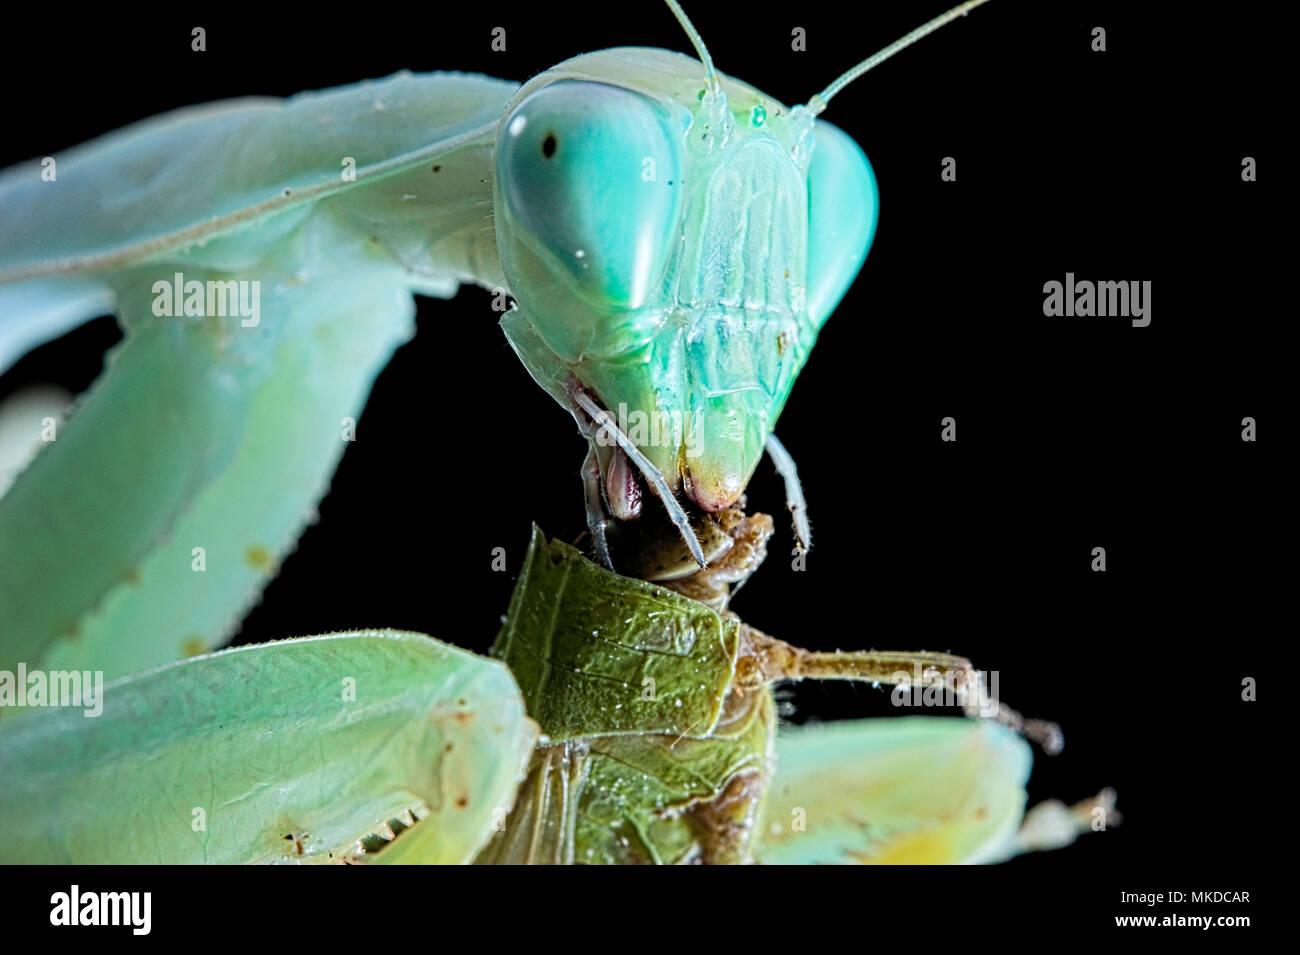 African praying mantis (Sphodromantis lineola) feeding on locust on black background. Stock Photo